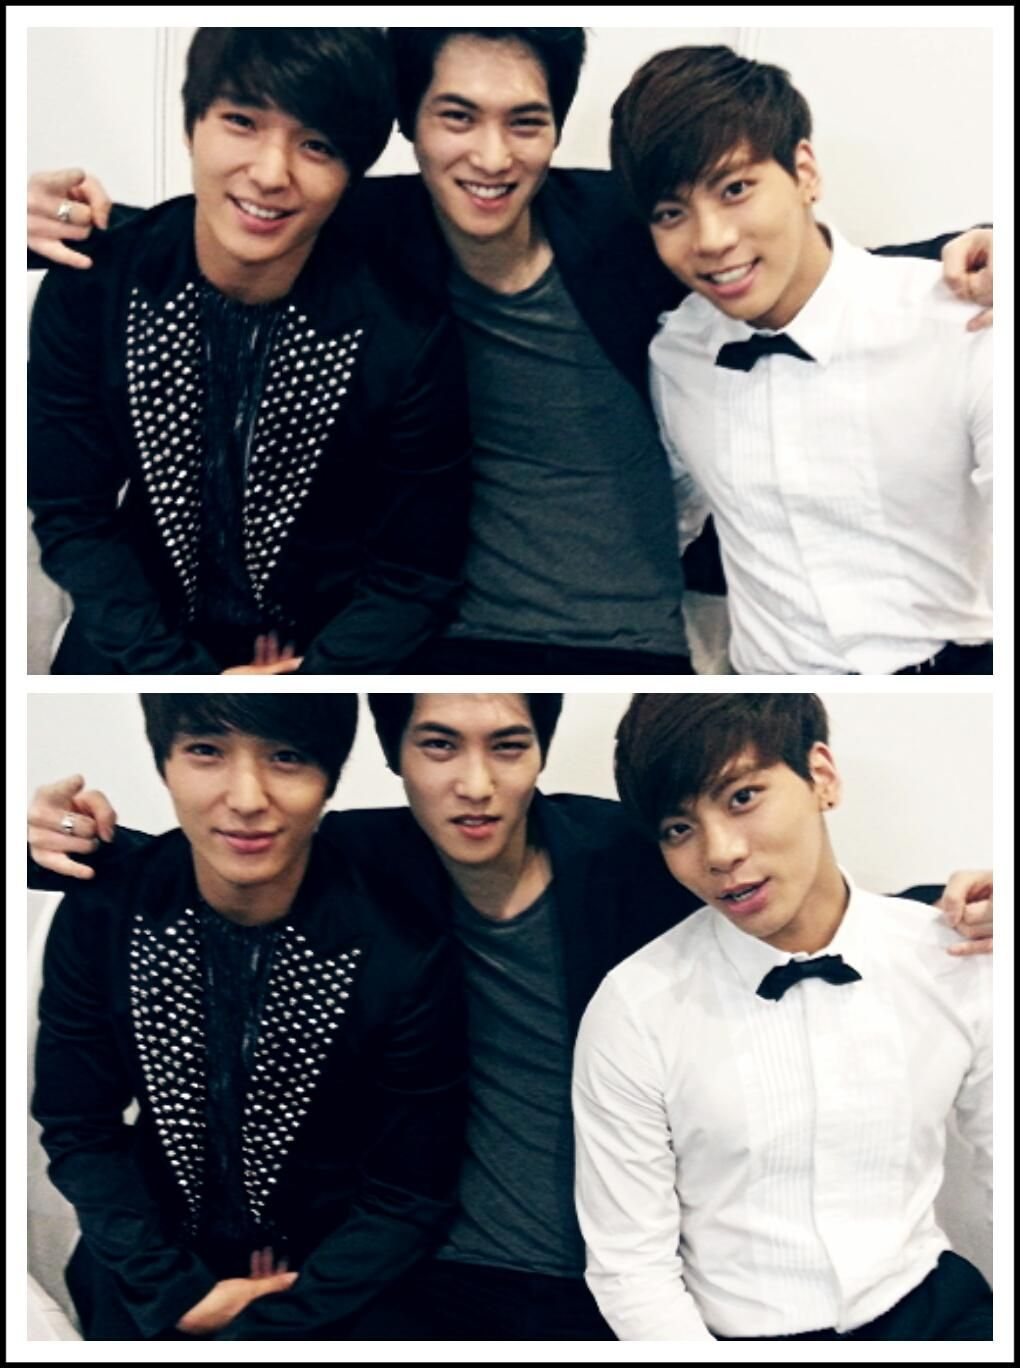 Twitter / FtGtJH: Jonghoon, CN Blue's Jonghyun & SHINee's Jonghyun, JH JH JH, Golden Disk, fighting